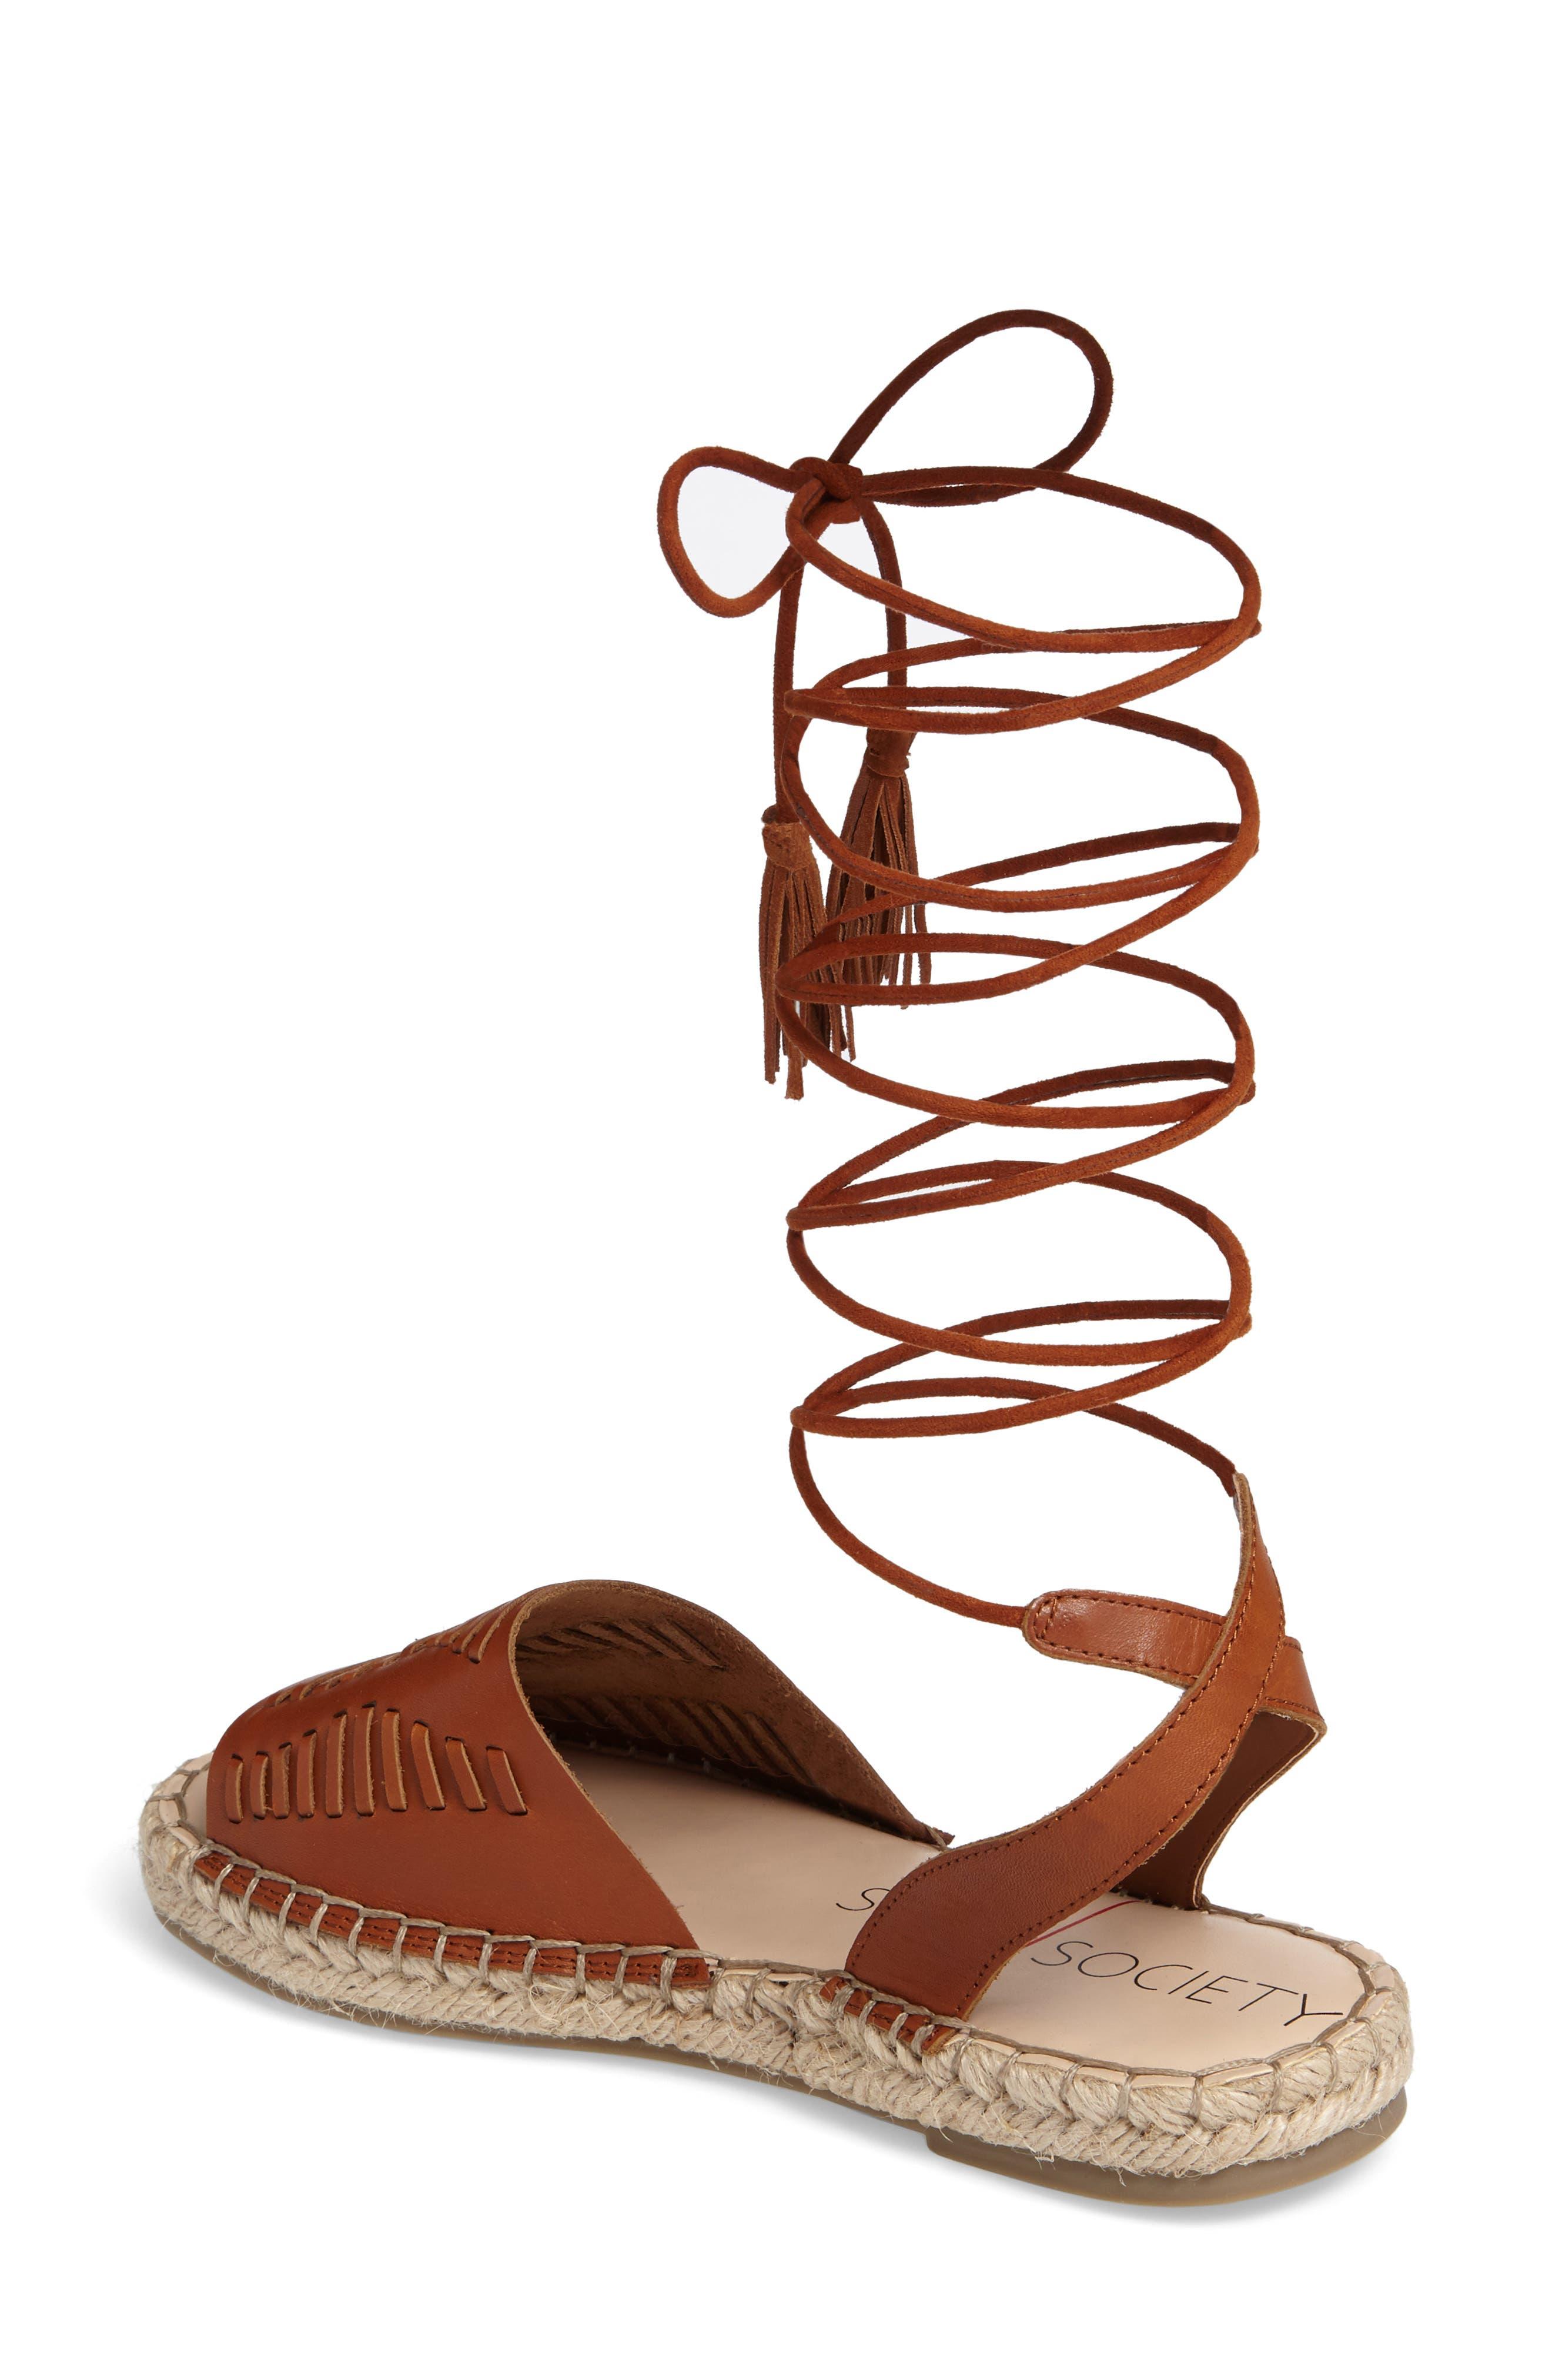 Clover Ankle Wrap Espadrille Sandal,                             Alternate thumbnail 2, color,                             212